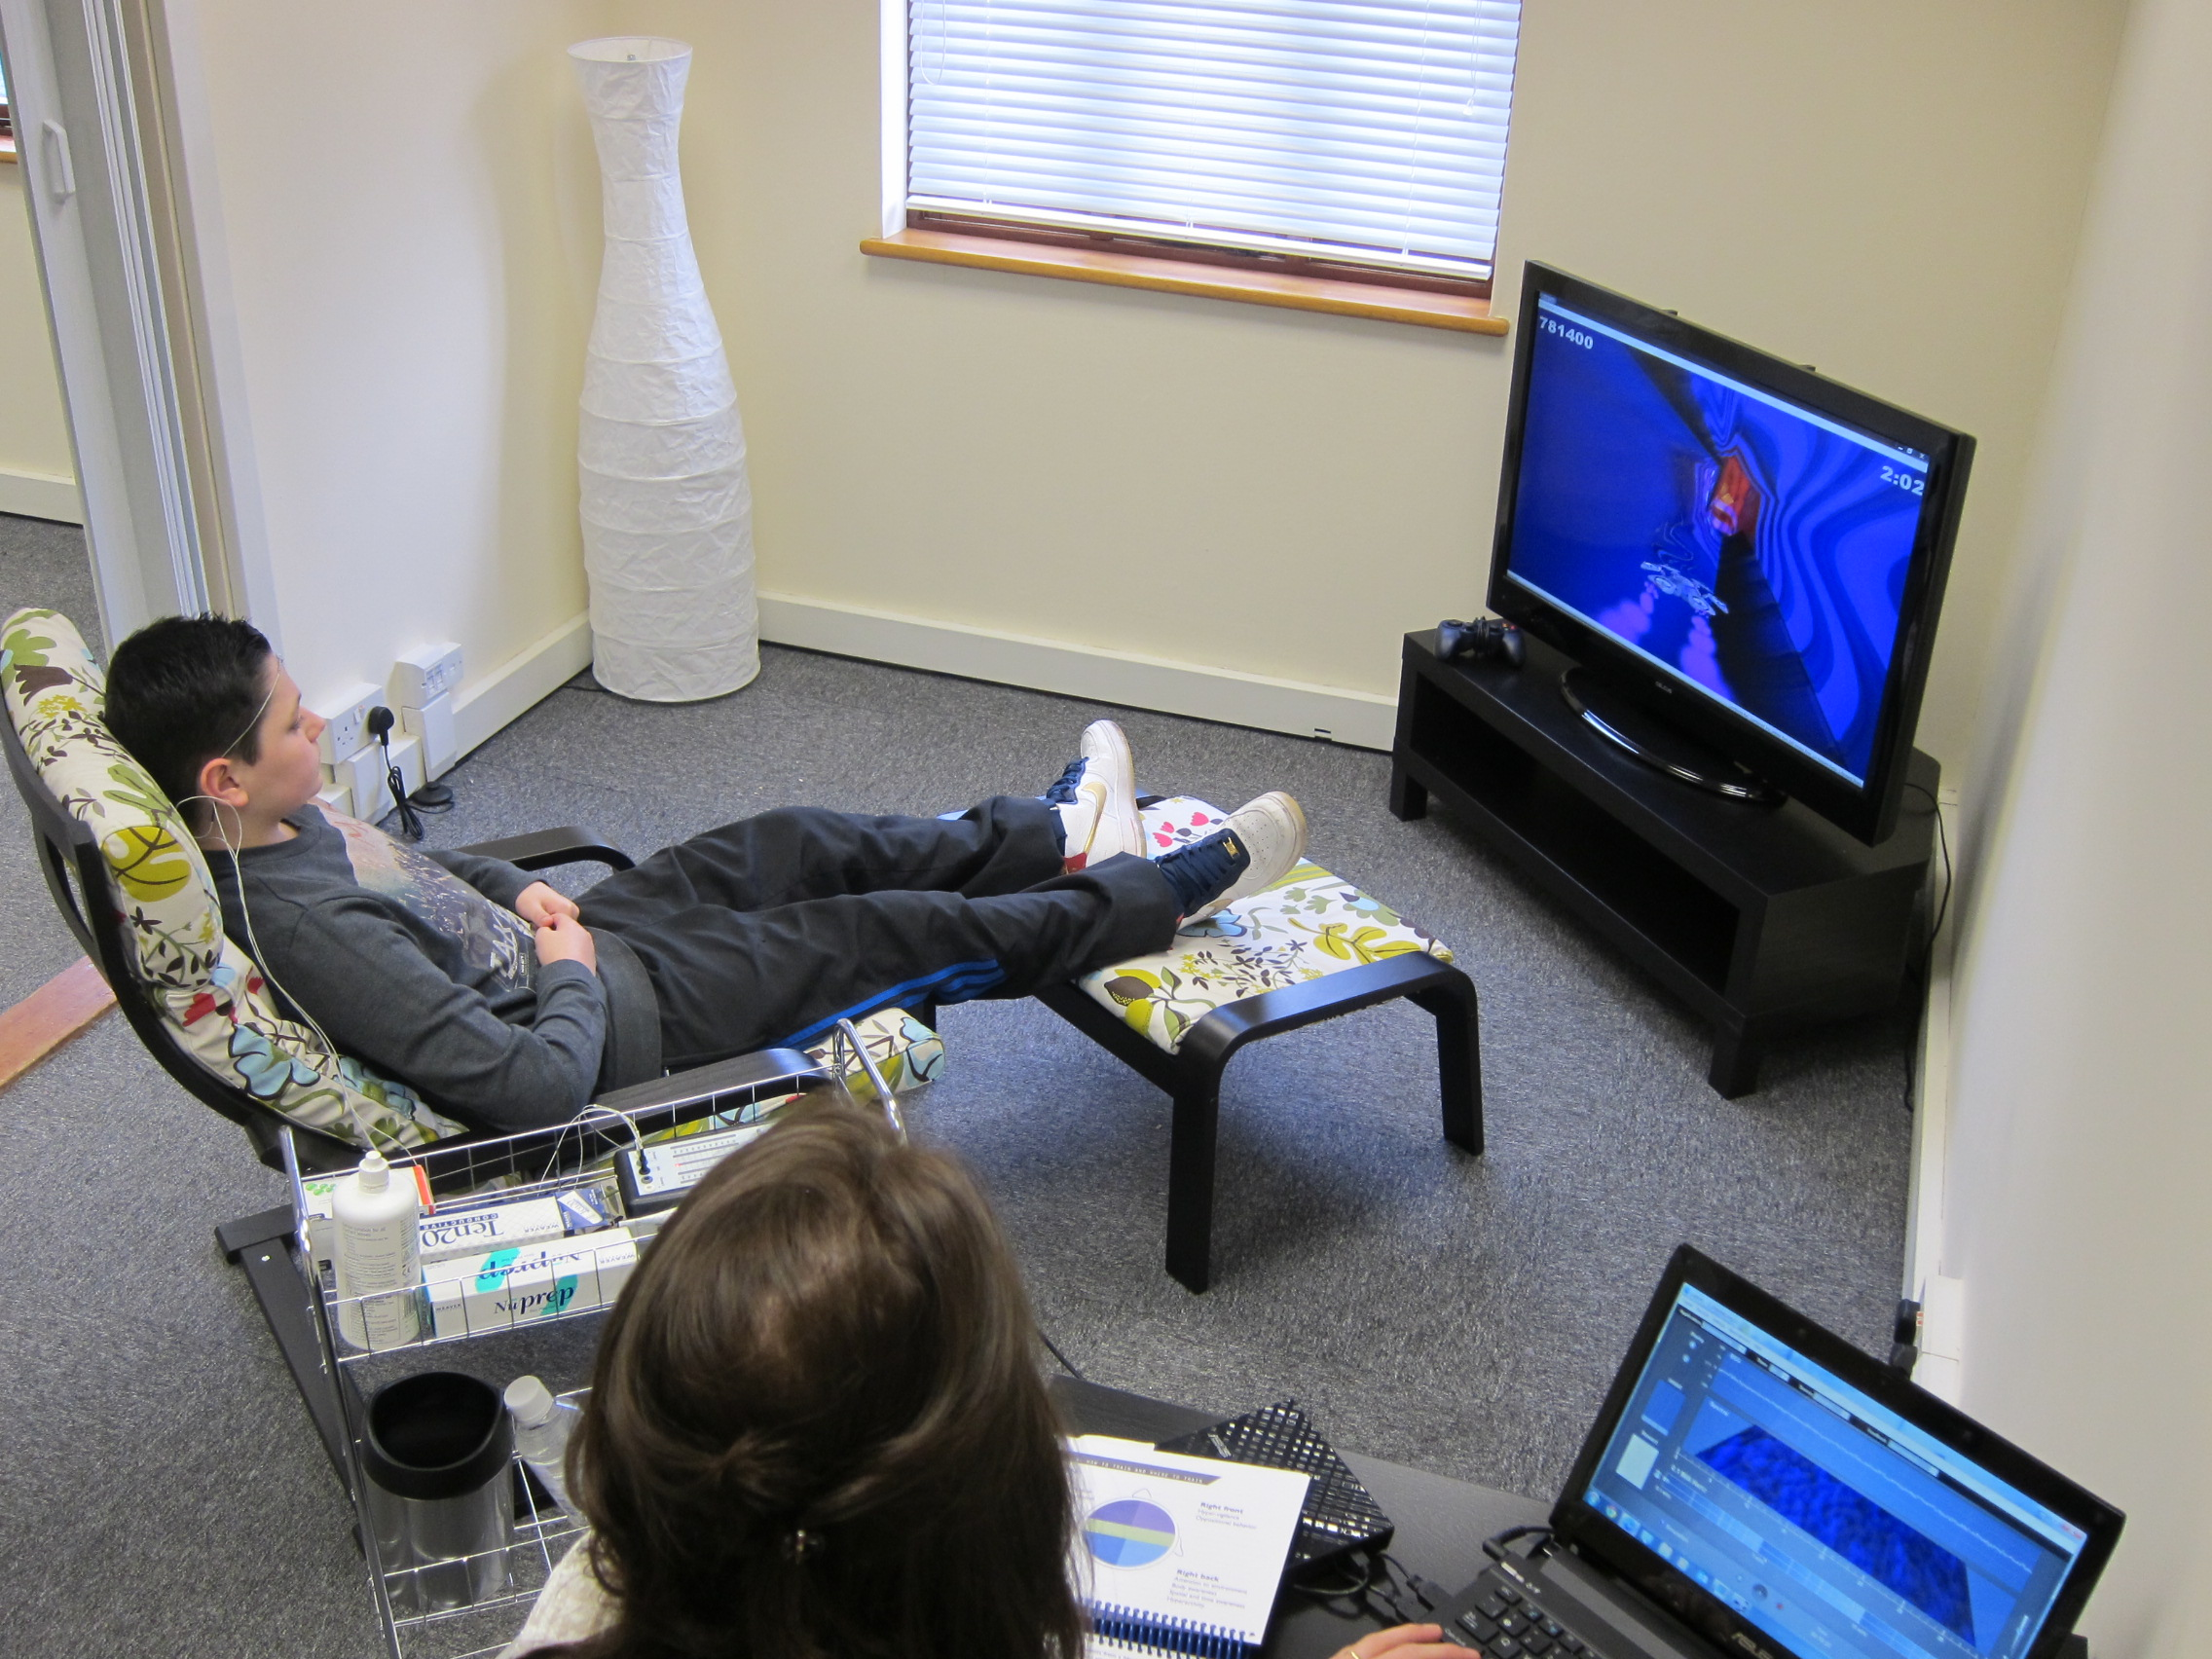 Neurofeedback in Action at BrainTrainUK